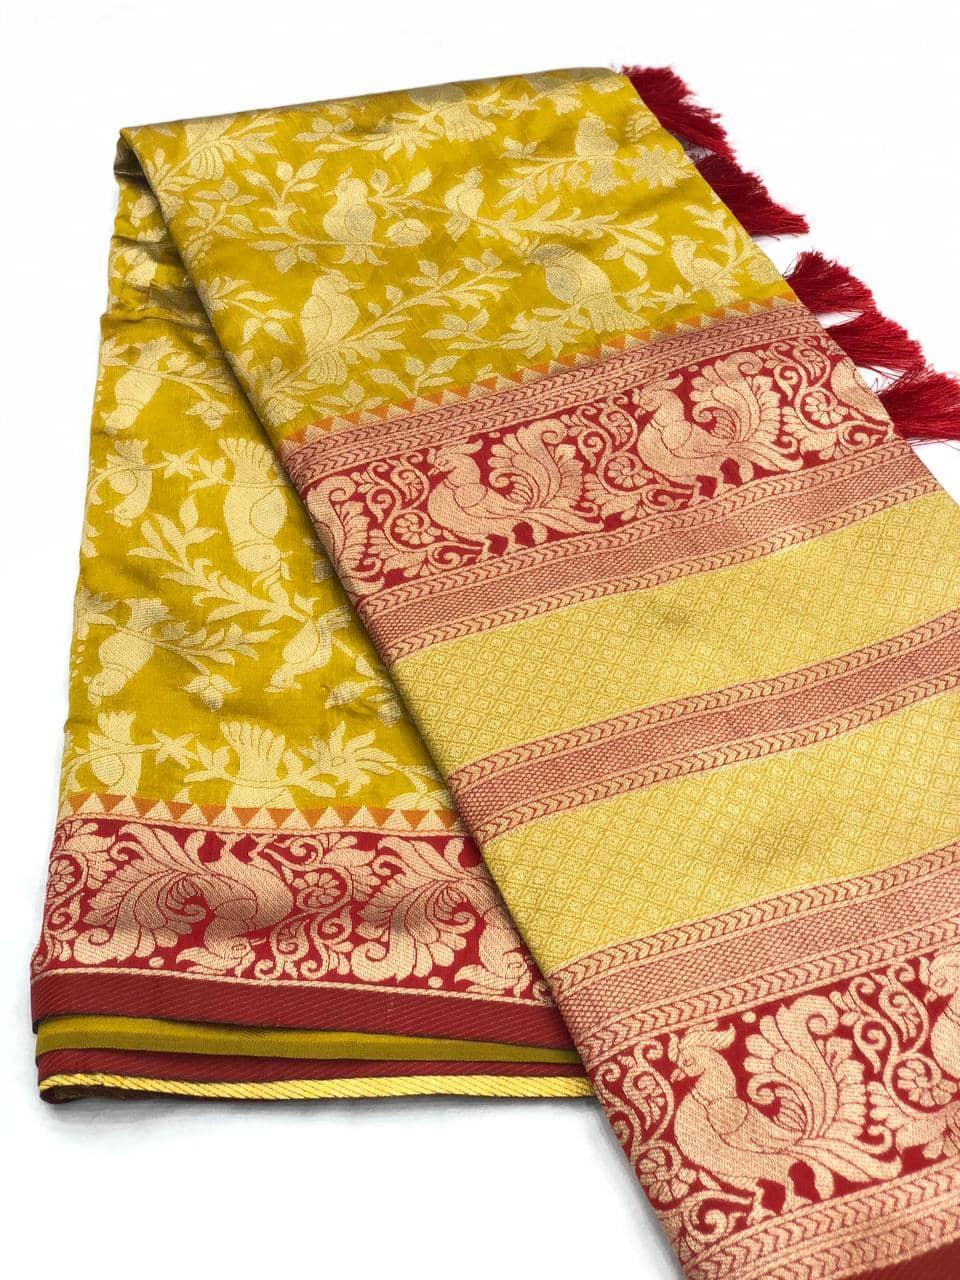 Stunning Kanchipuram Silk Traditional Saree in Green dvz0001758